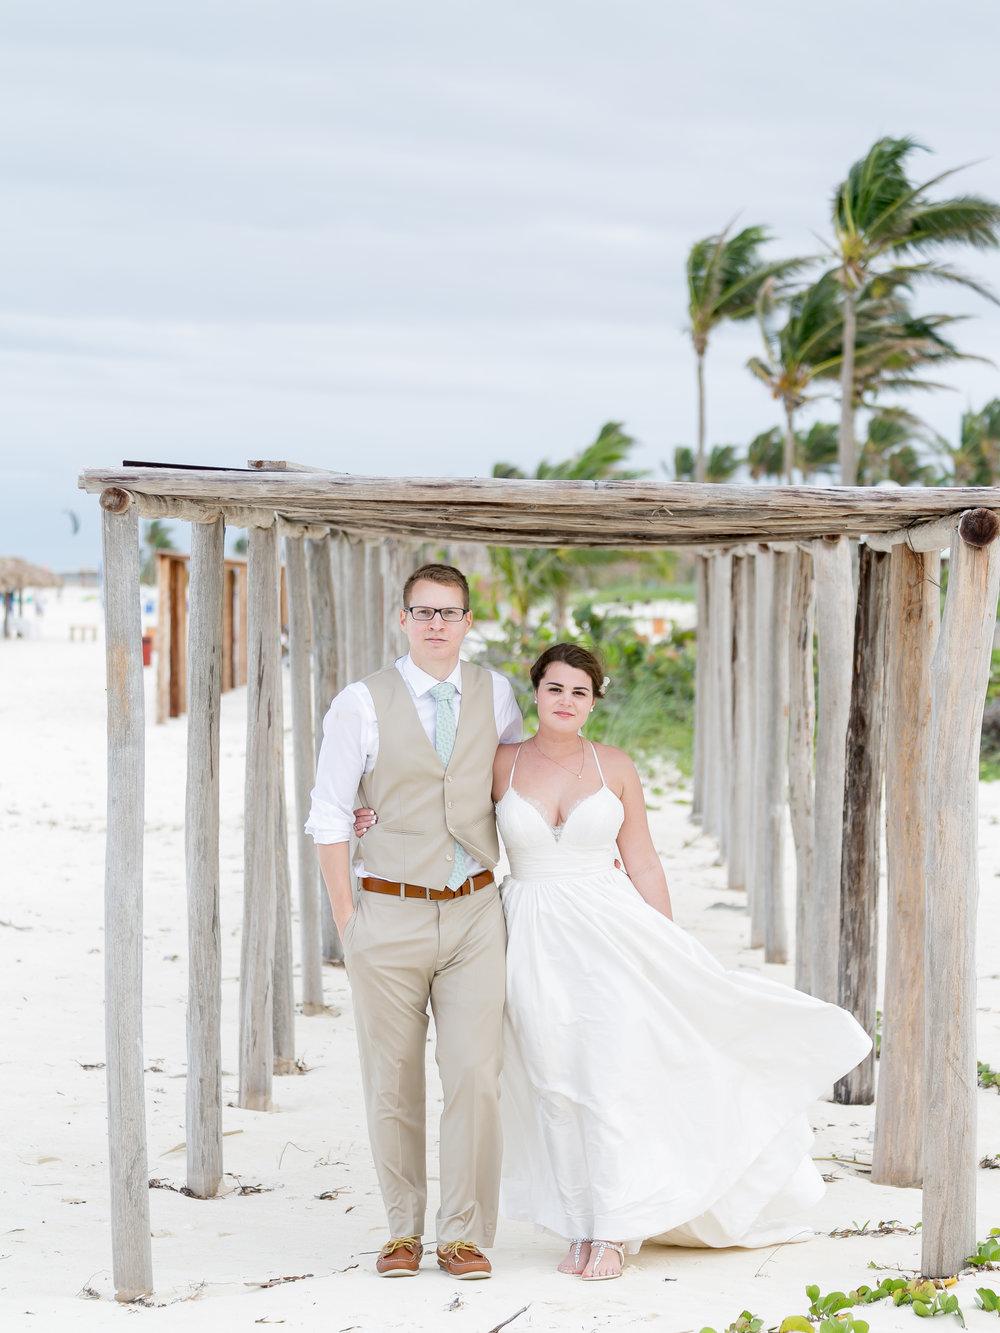 Cayco-Coco-Cuba-Wedding-512.jpg